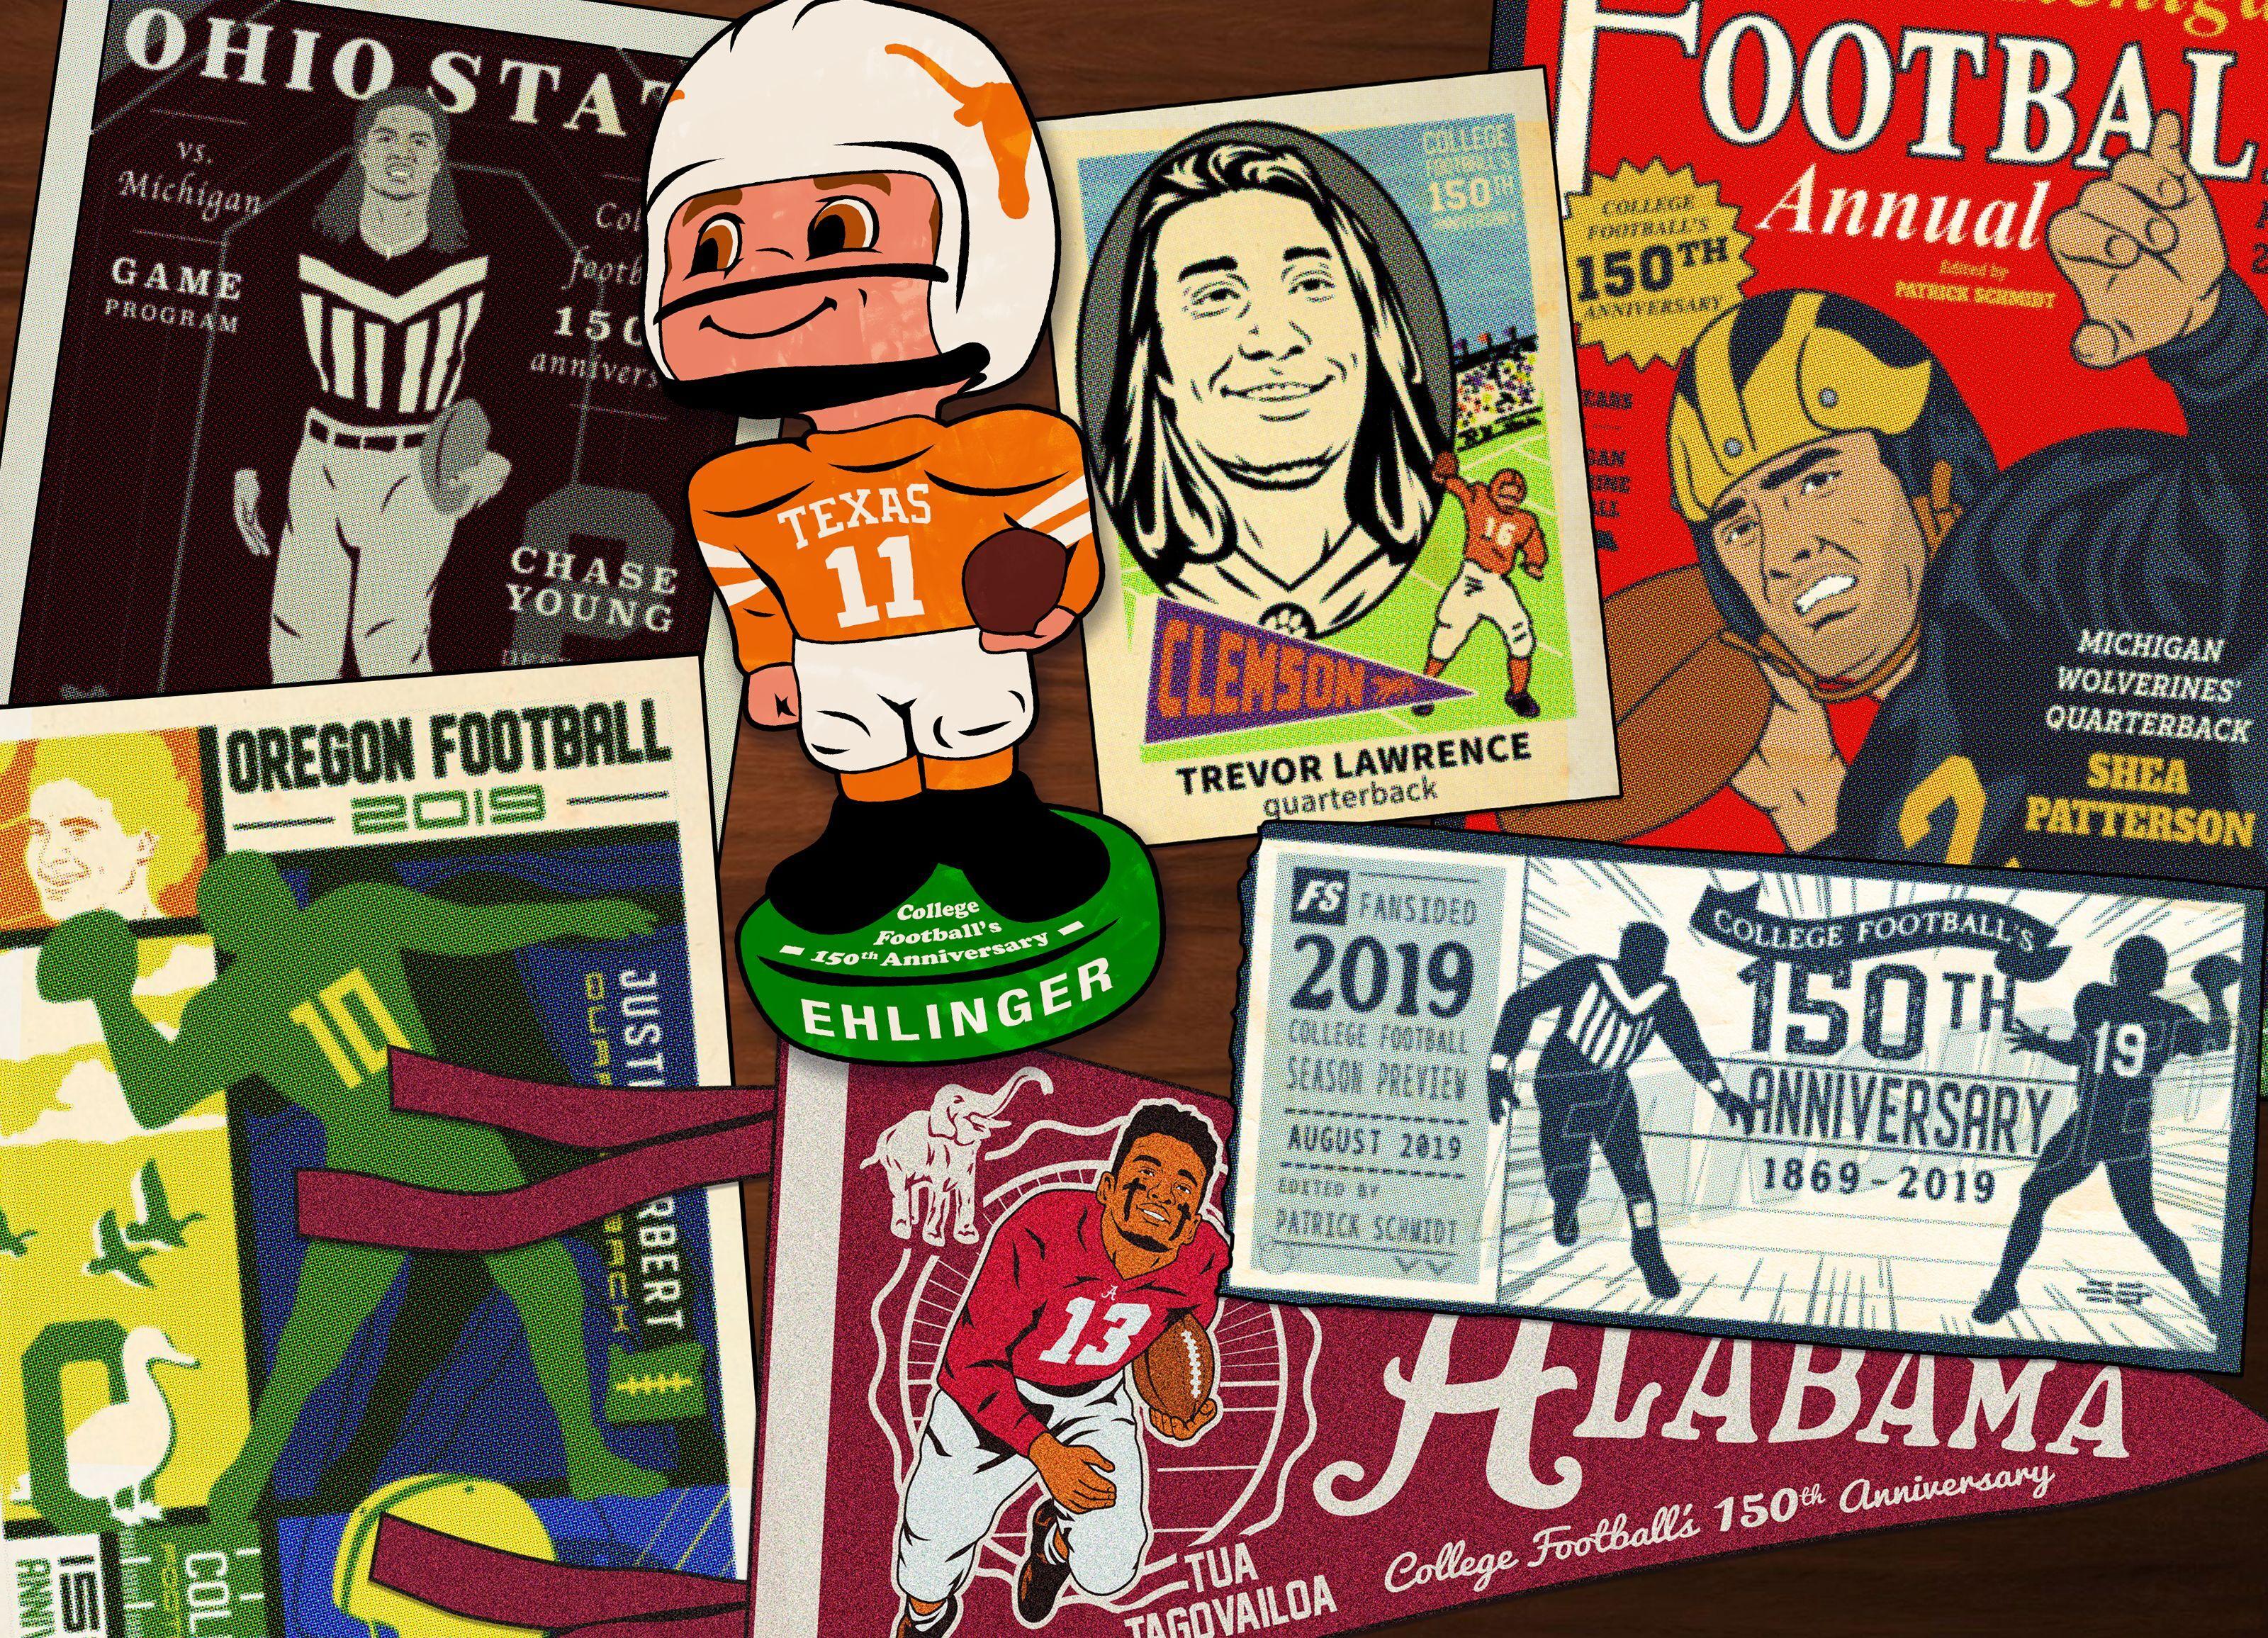 College football predictions: Heisman, Playoff, Power 5